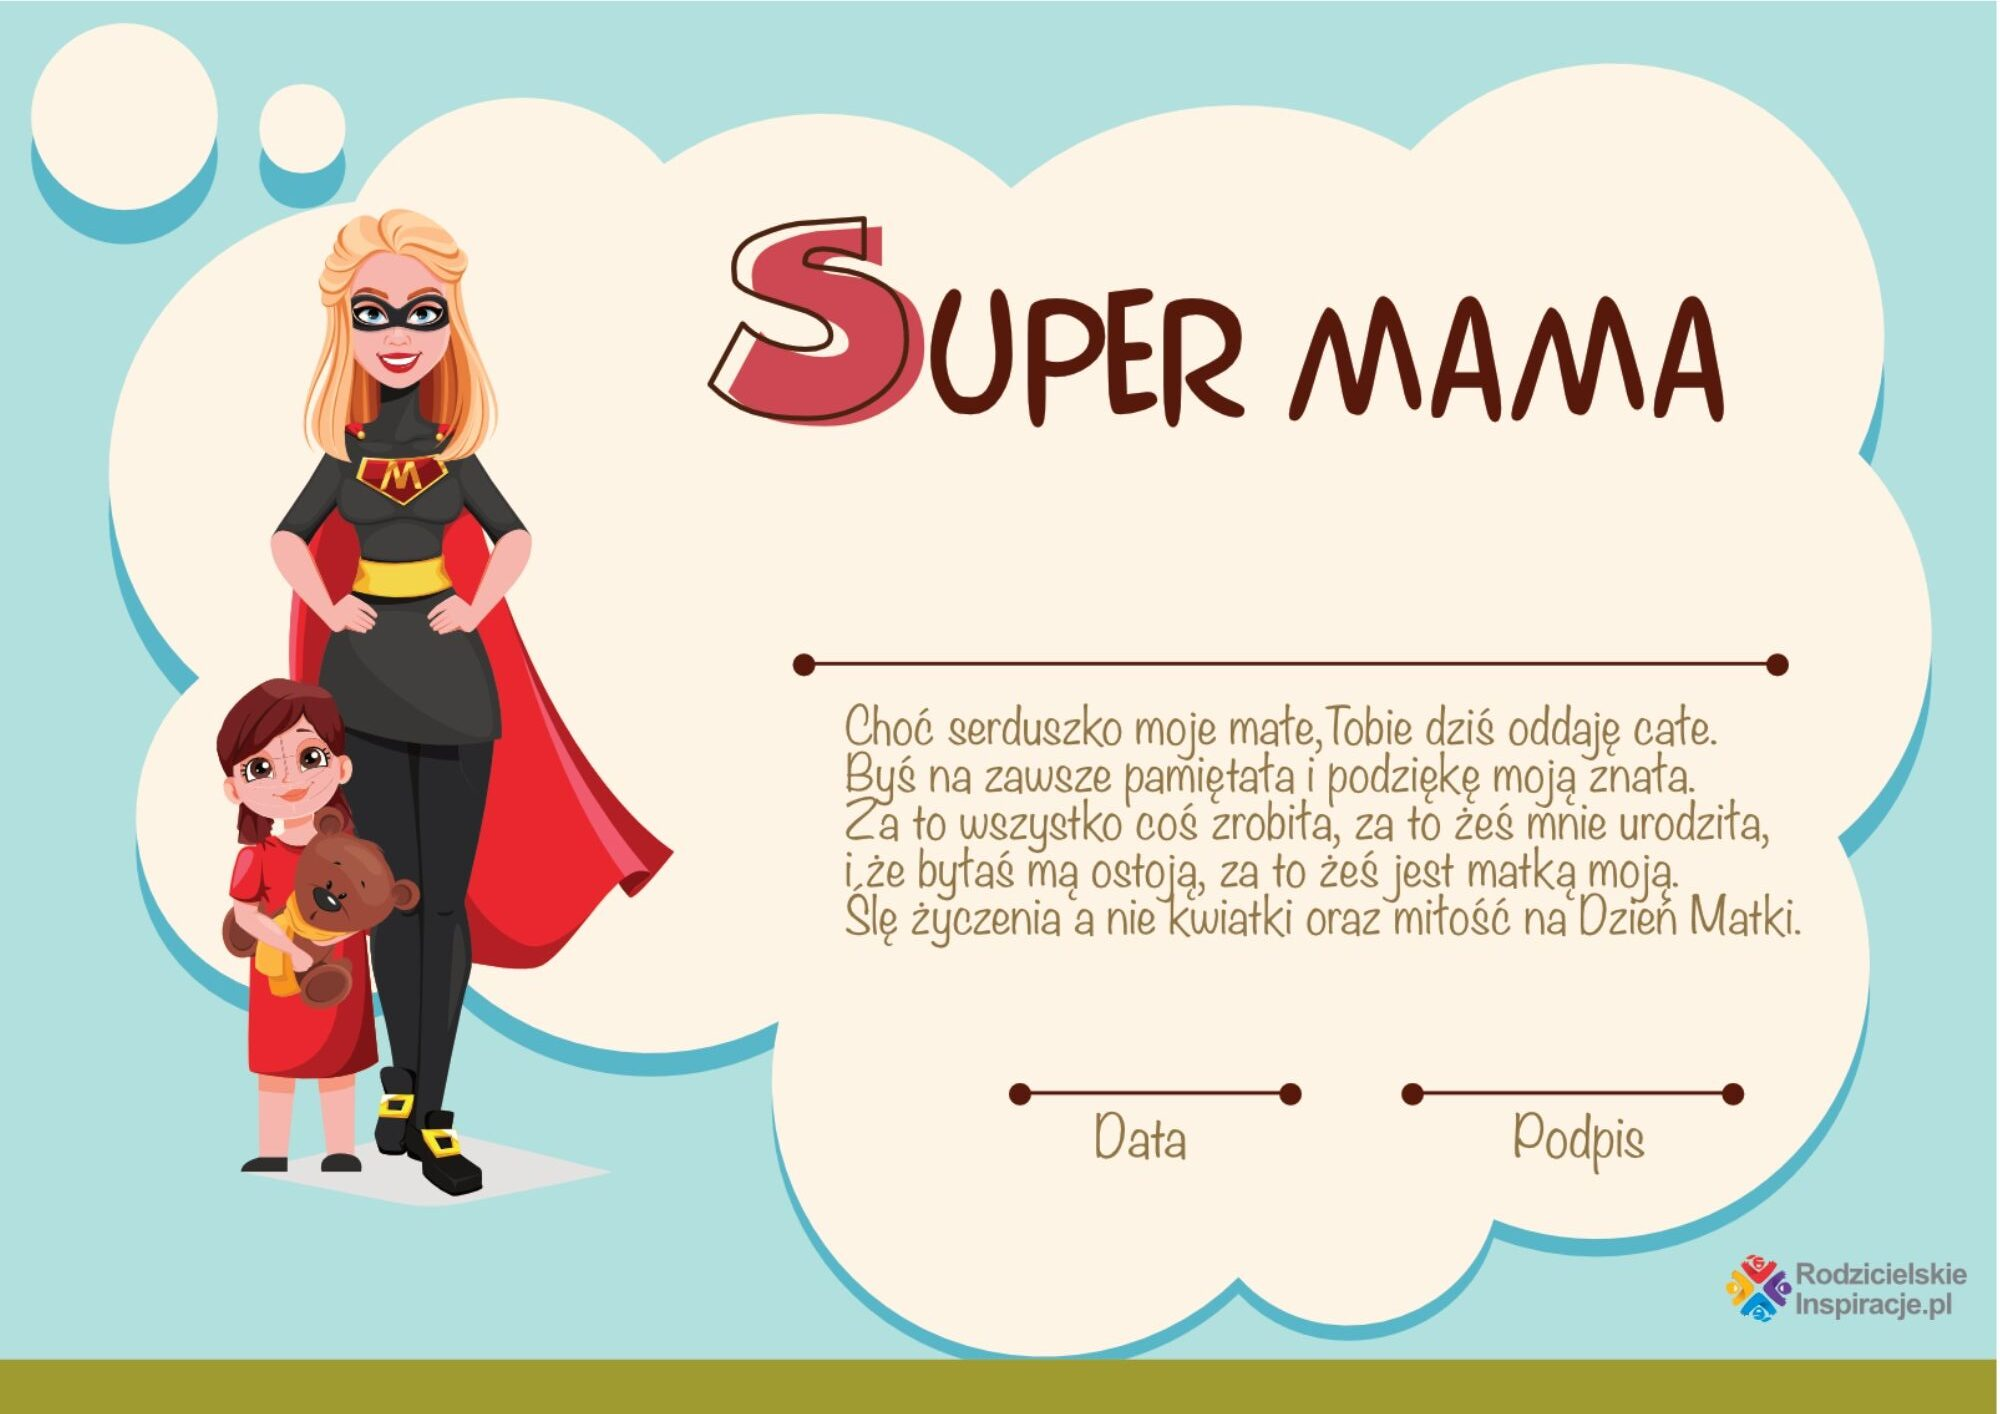 dyplom-dzien-mamy-super-mama-2